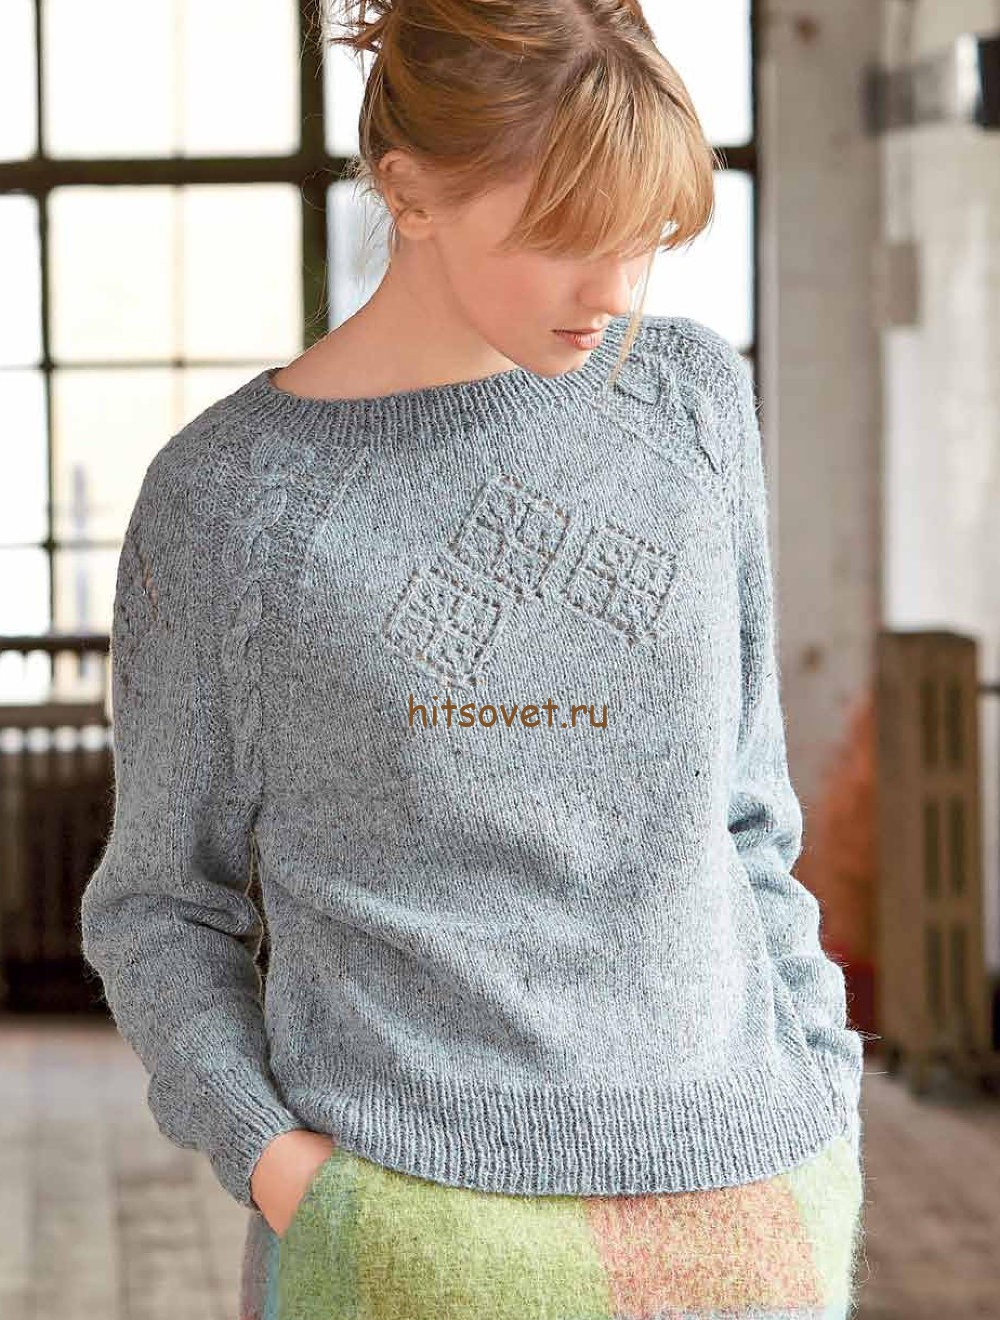 Женский свитер спицами со схемами 2015 2016 фото 433